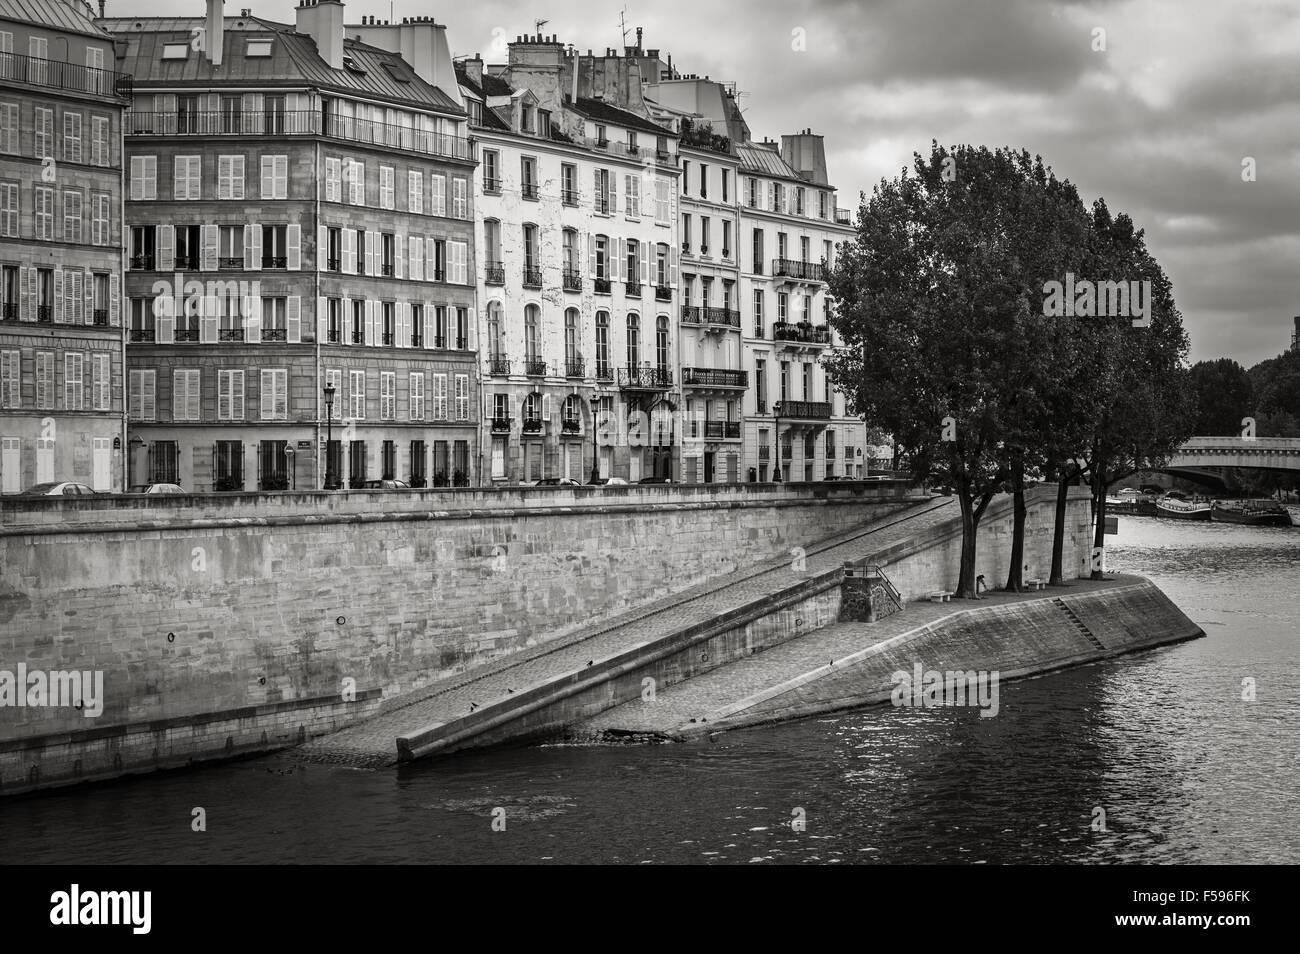 Seine River Bank on Ile Saint Louis in the heart of Paris (75004), France. Quai d'Orléans in Black & - Stock Image